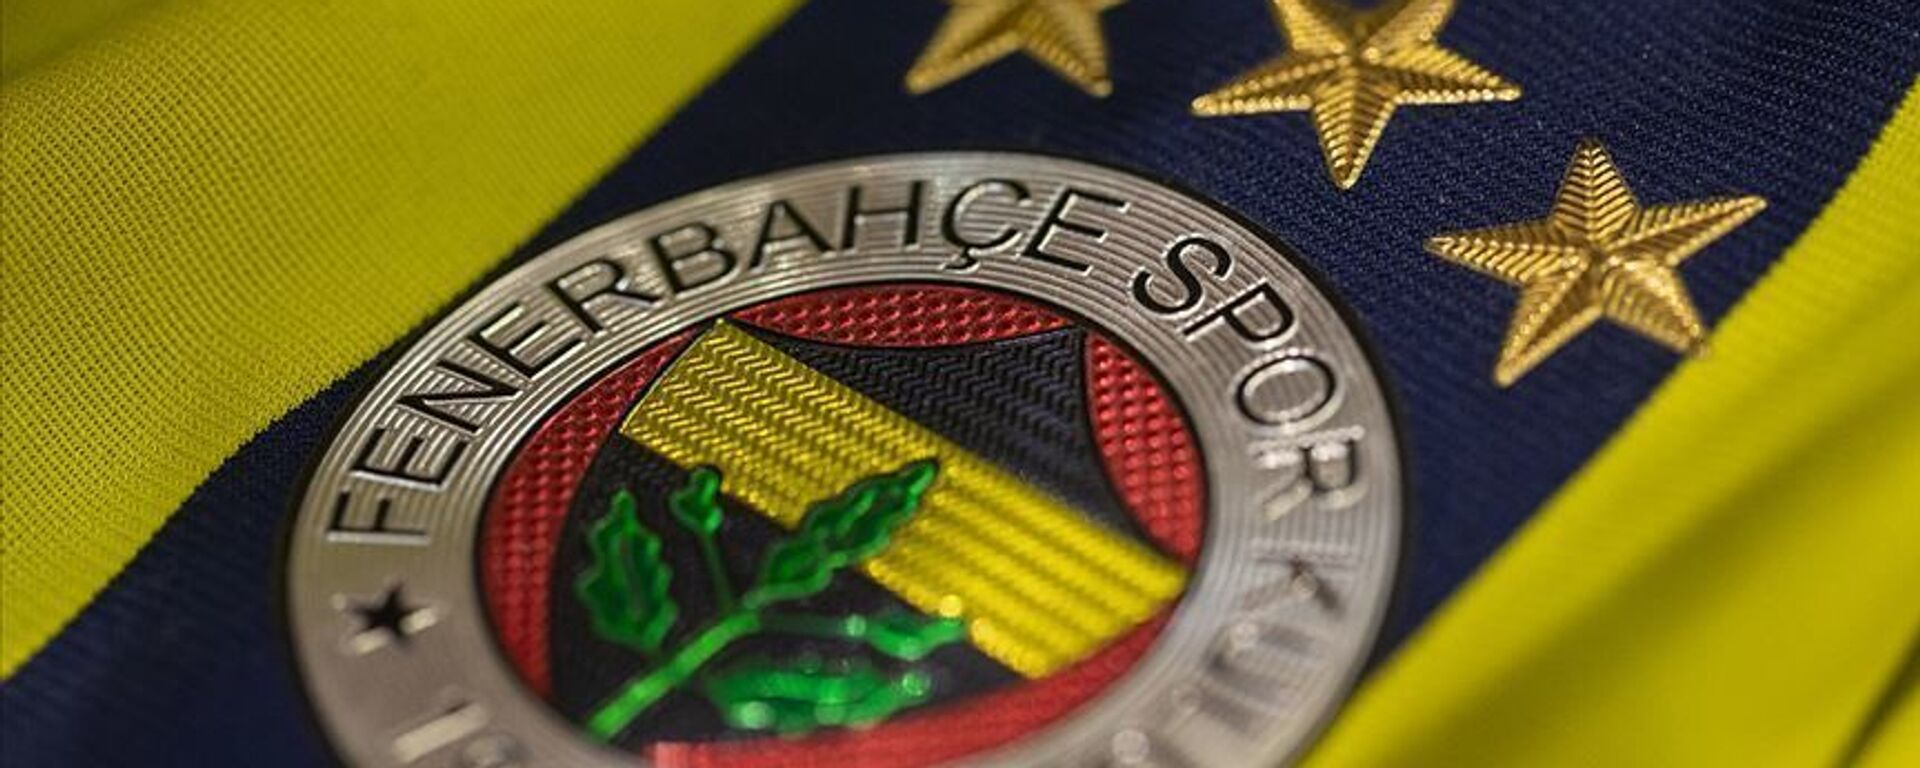 Fenerbahçe arma, forma, logo - Sputnik Türkiye, 1920, 07.04.2021